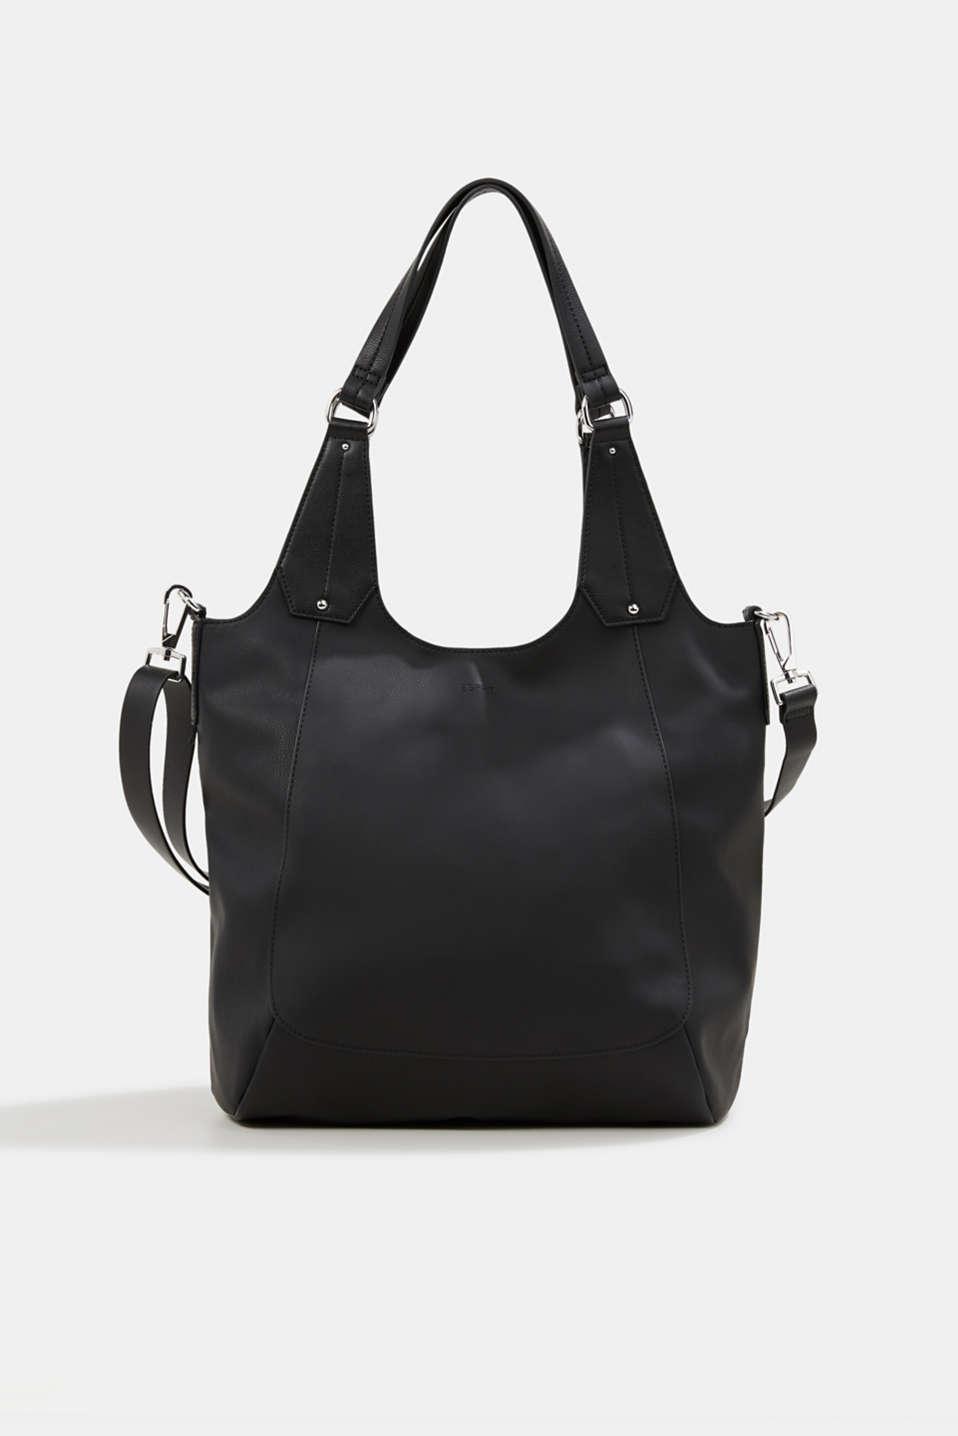 XL shopper in faux leather, vegan, BLACK, detail image number 0